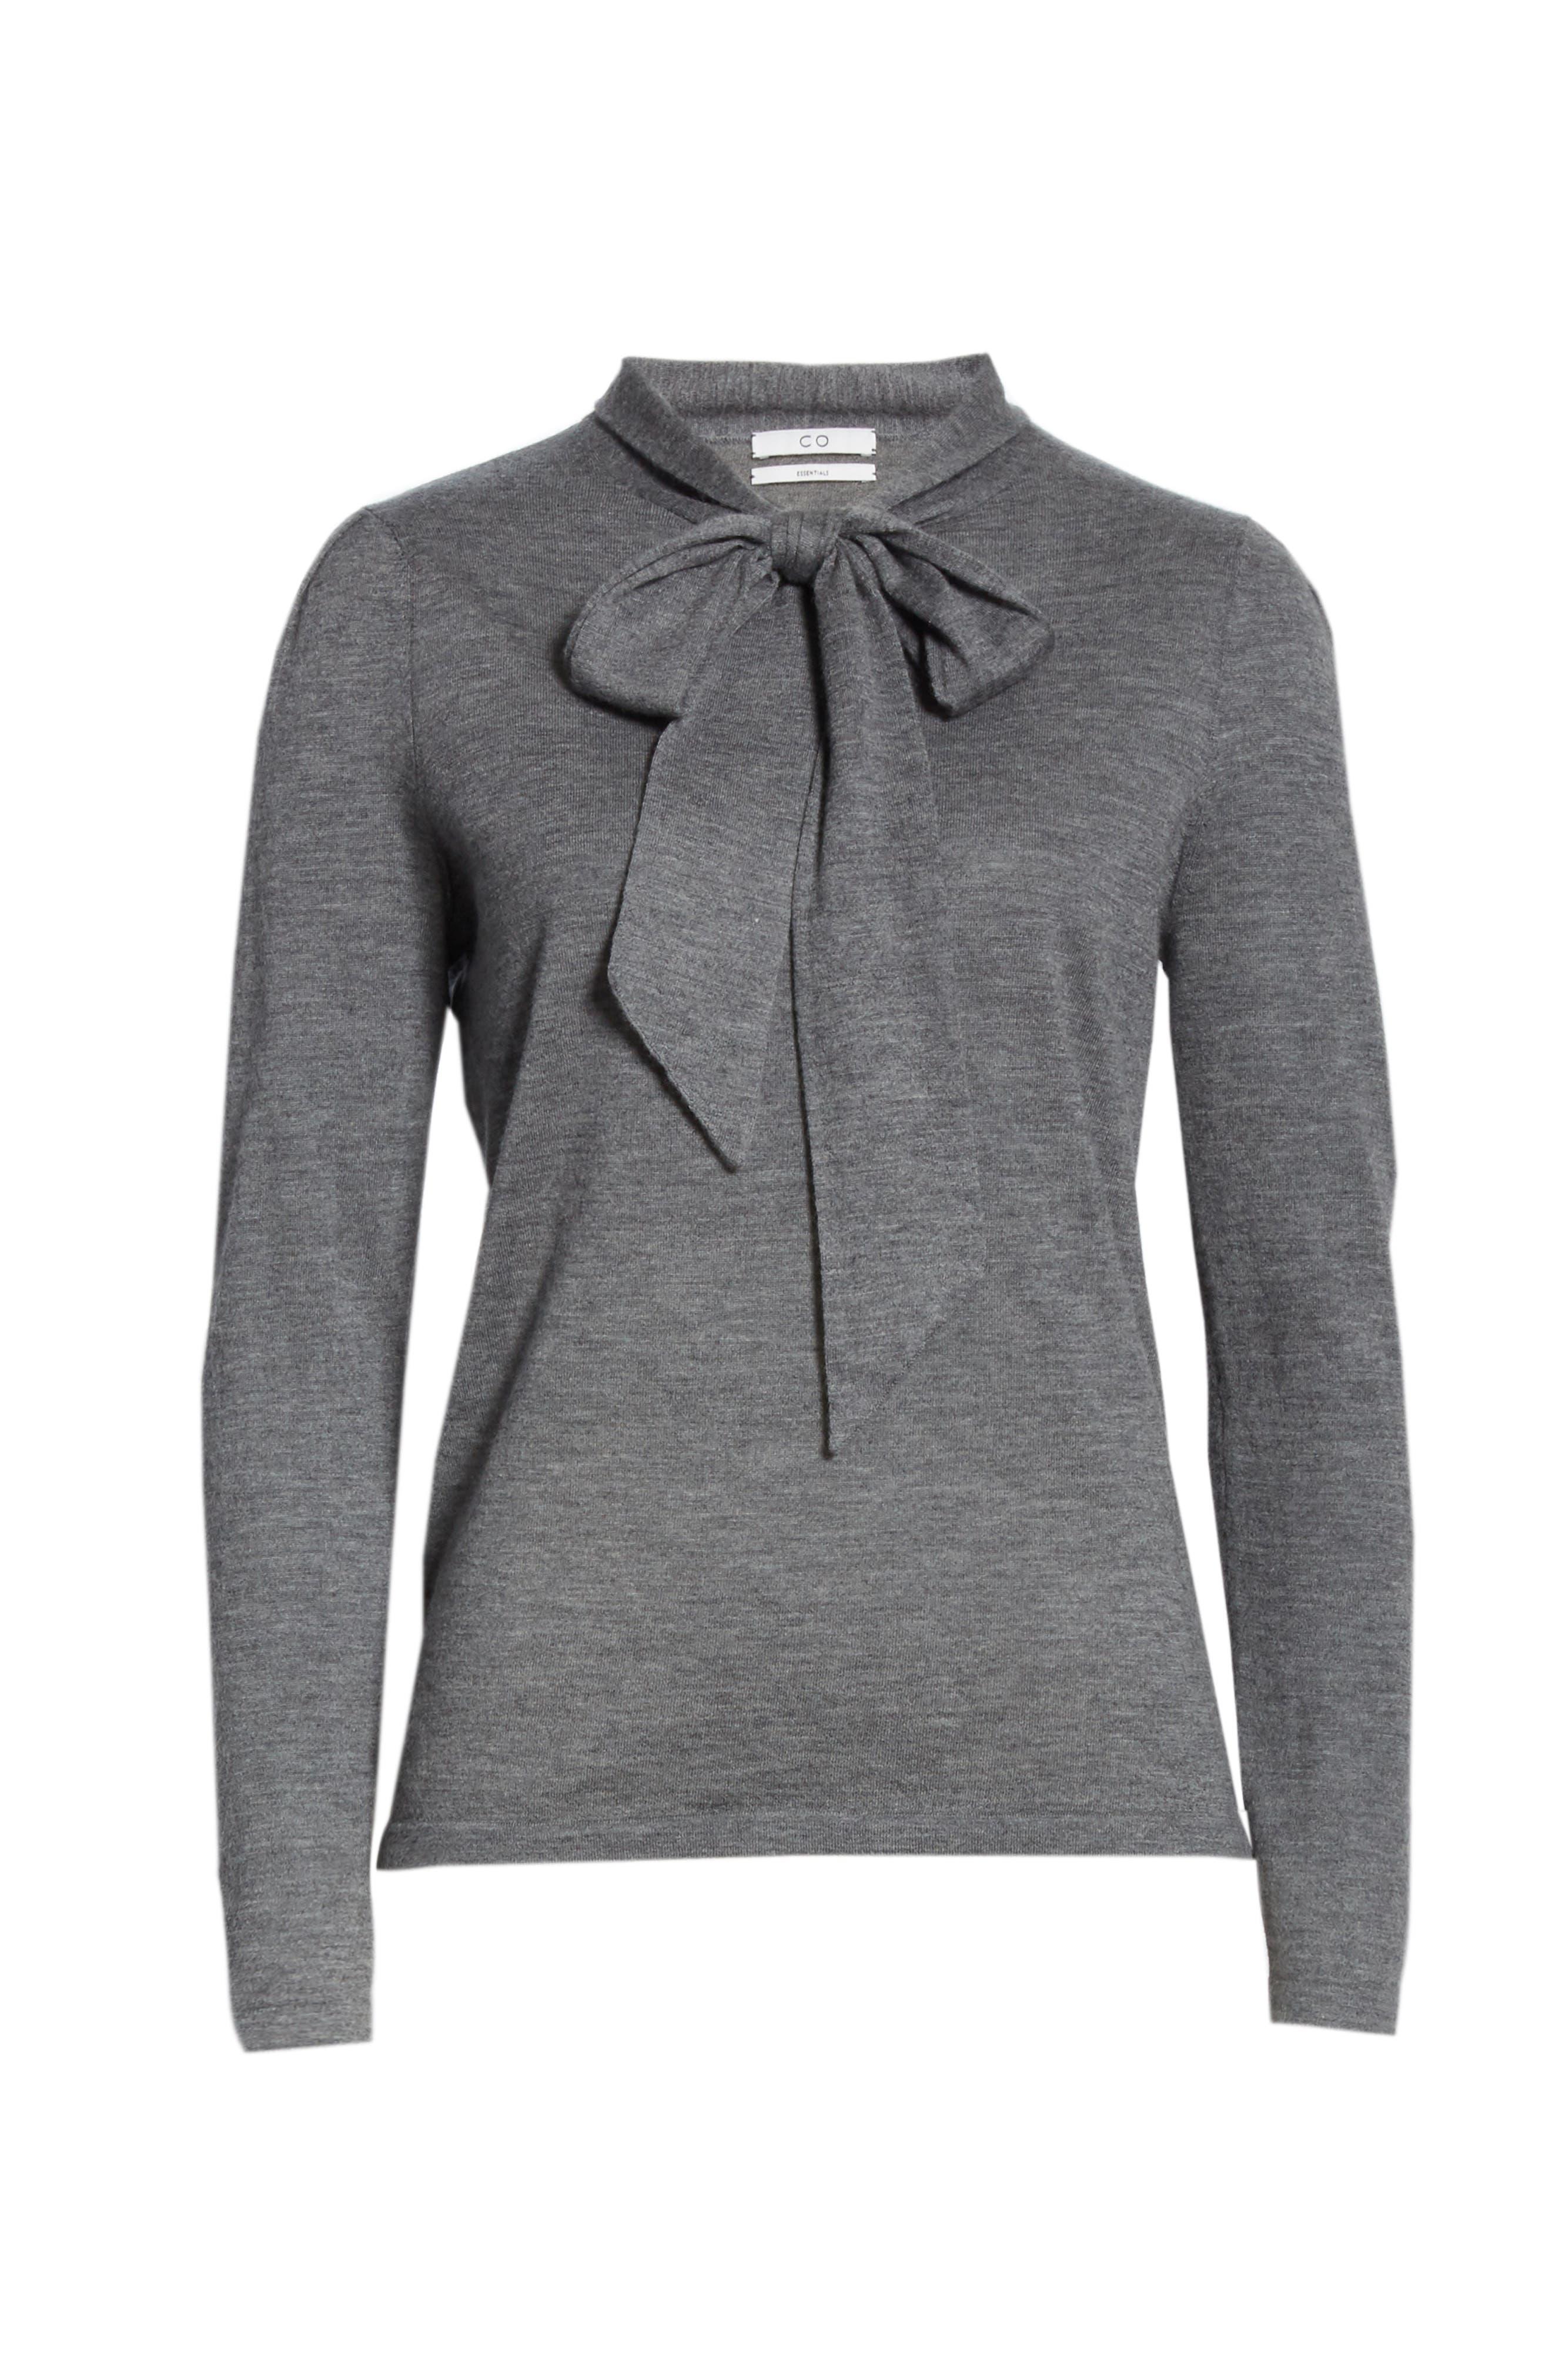 Essentials Tie Neck Cashmere Sweater,                             Alternate thumbnail 6, color,                             GREY